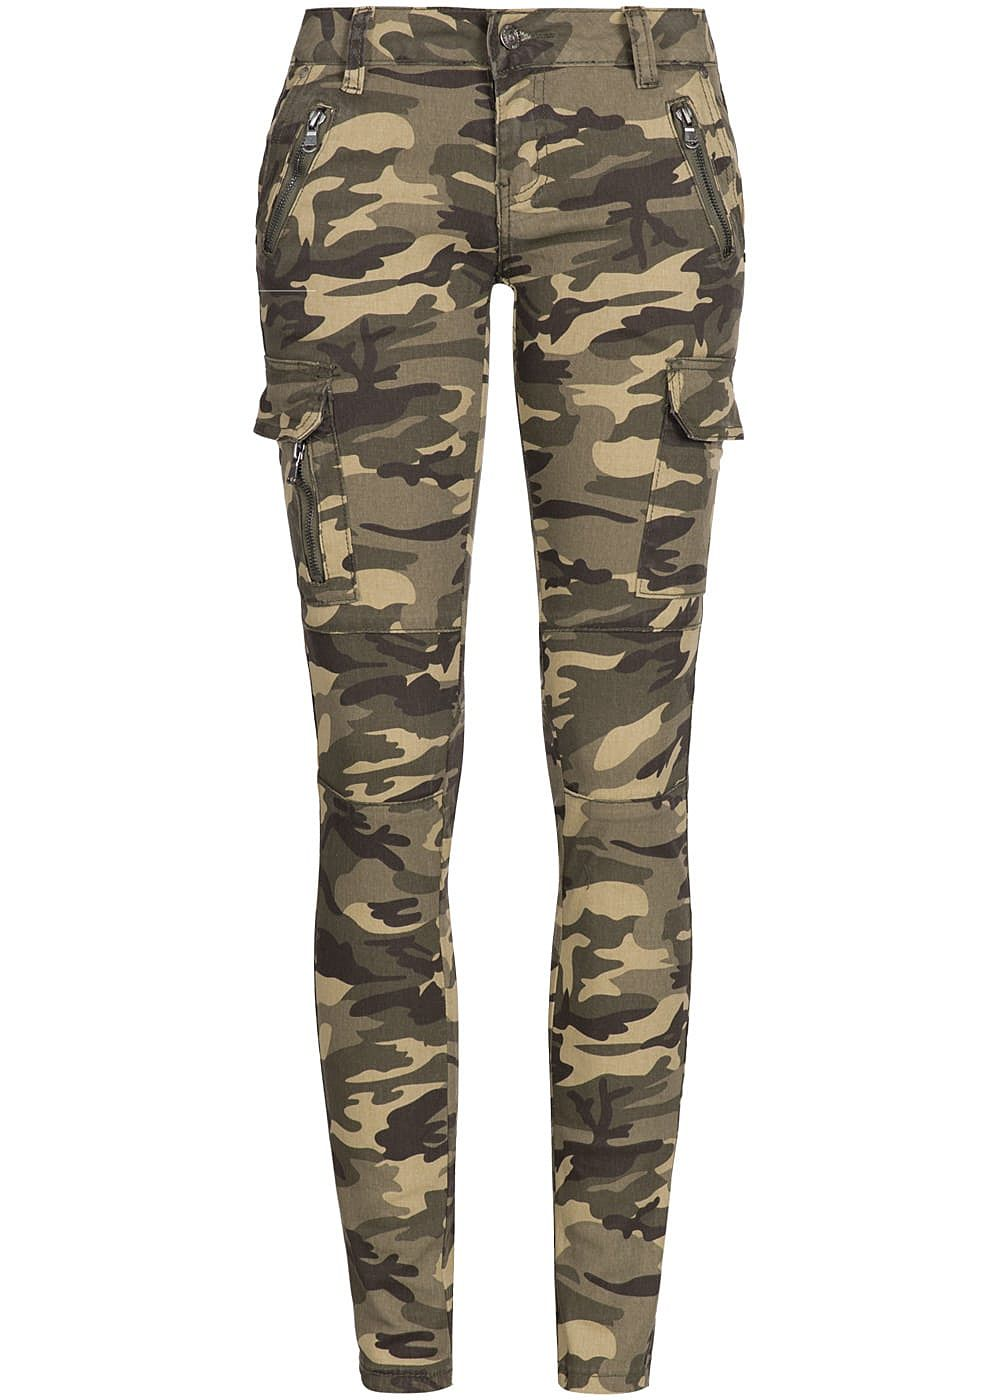 seventyseven lifestyle damen cargo jeans hose 6 pockets 2 deko zipper camouflage 77onlineshop. Black Bedroom Furniture Sets. Home Design Ideas